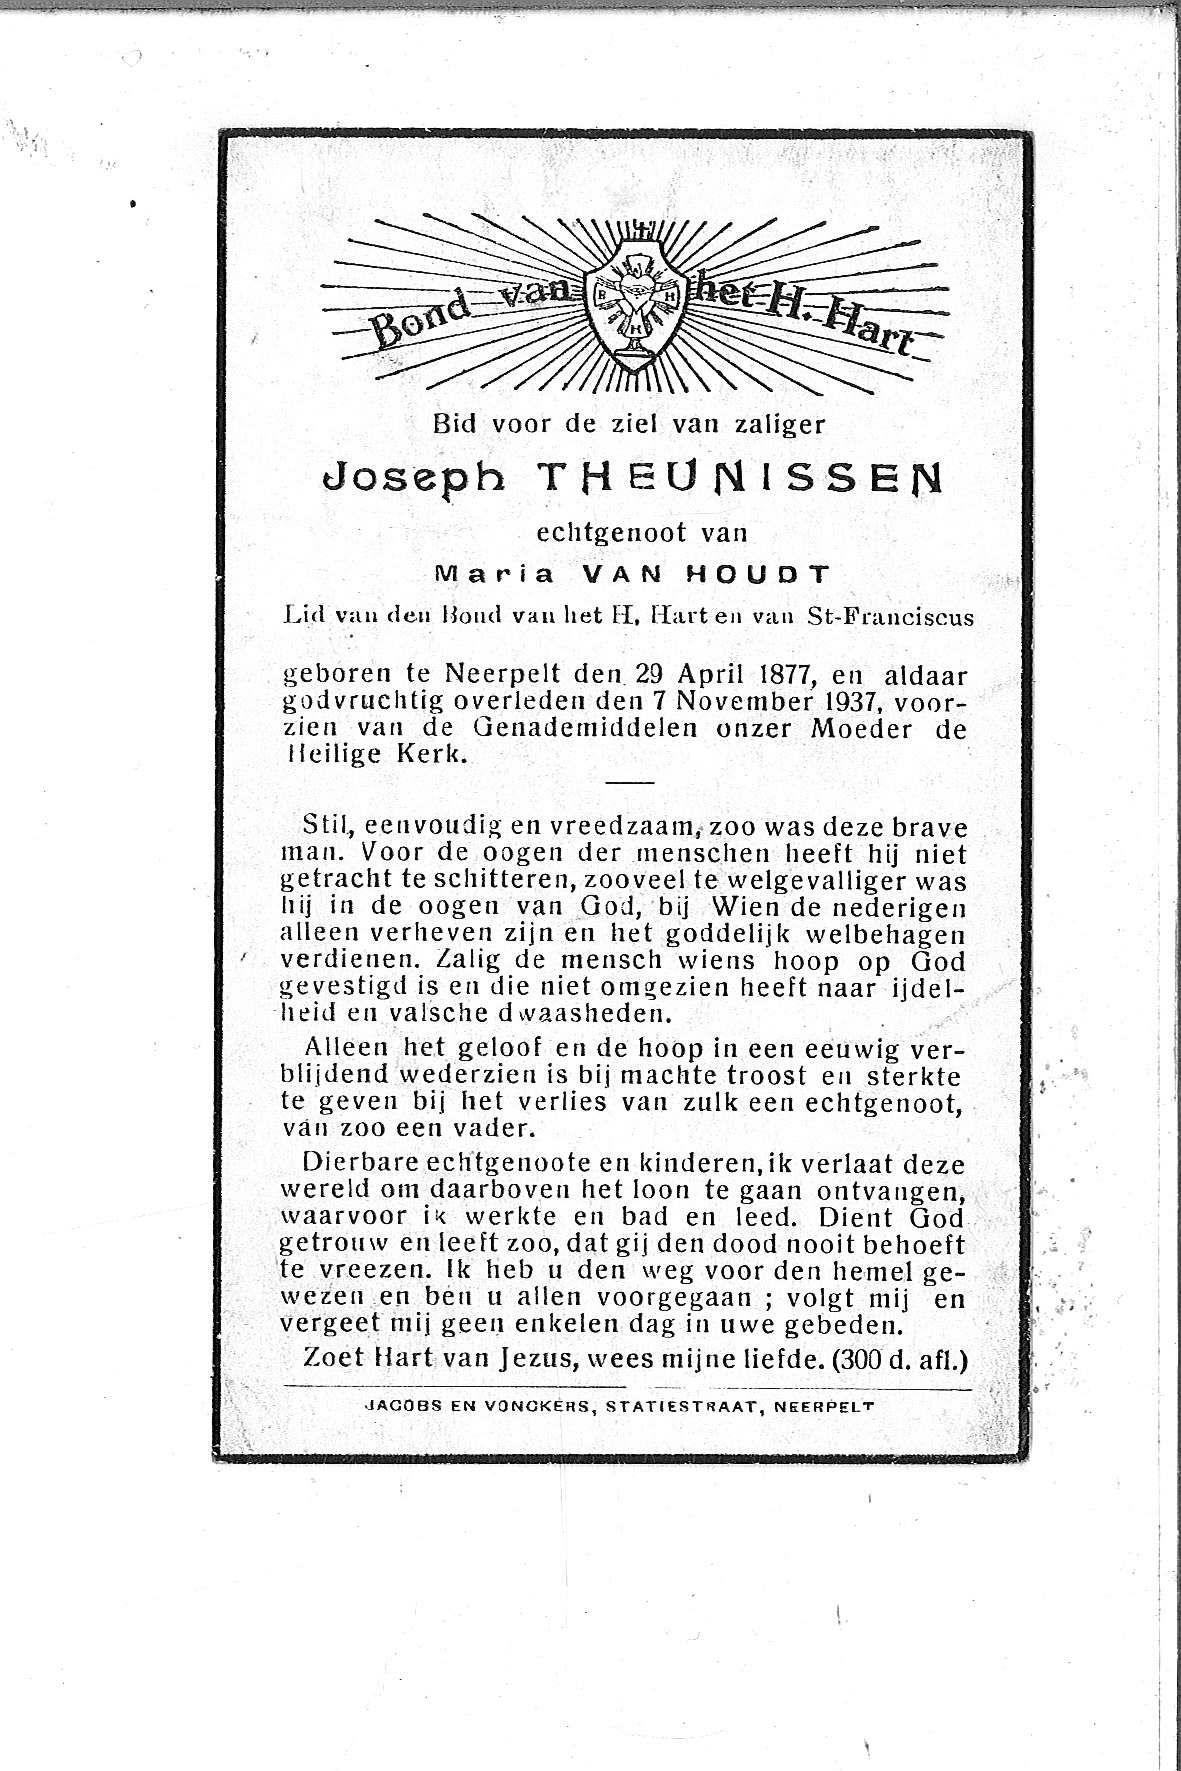 Joseph(1937)20140813084409_00029.jpg